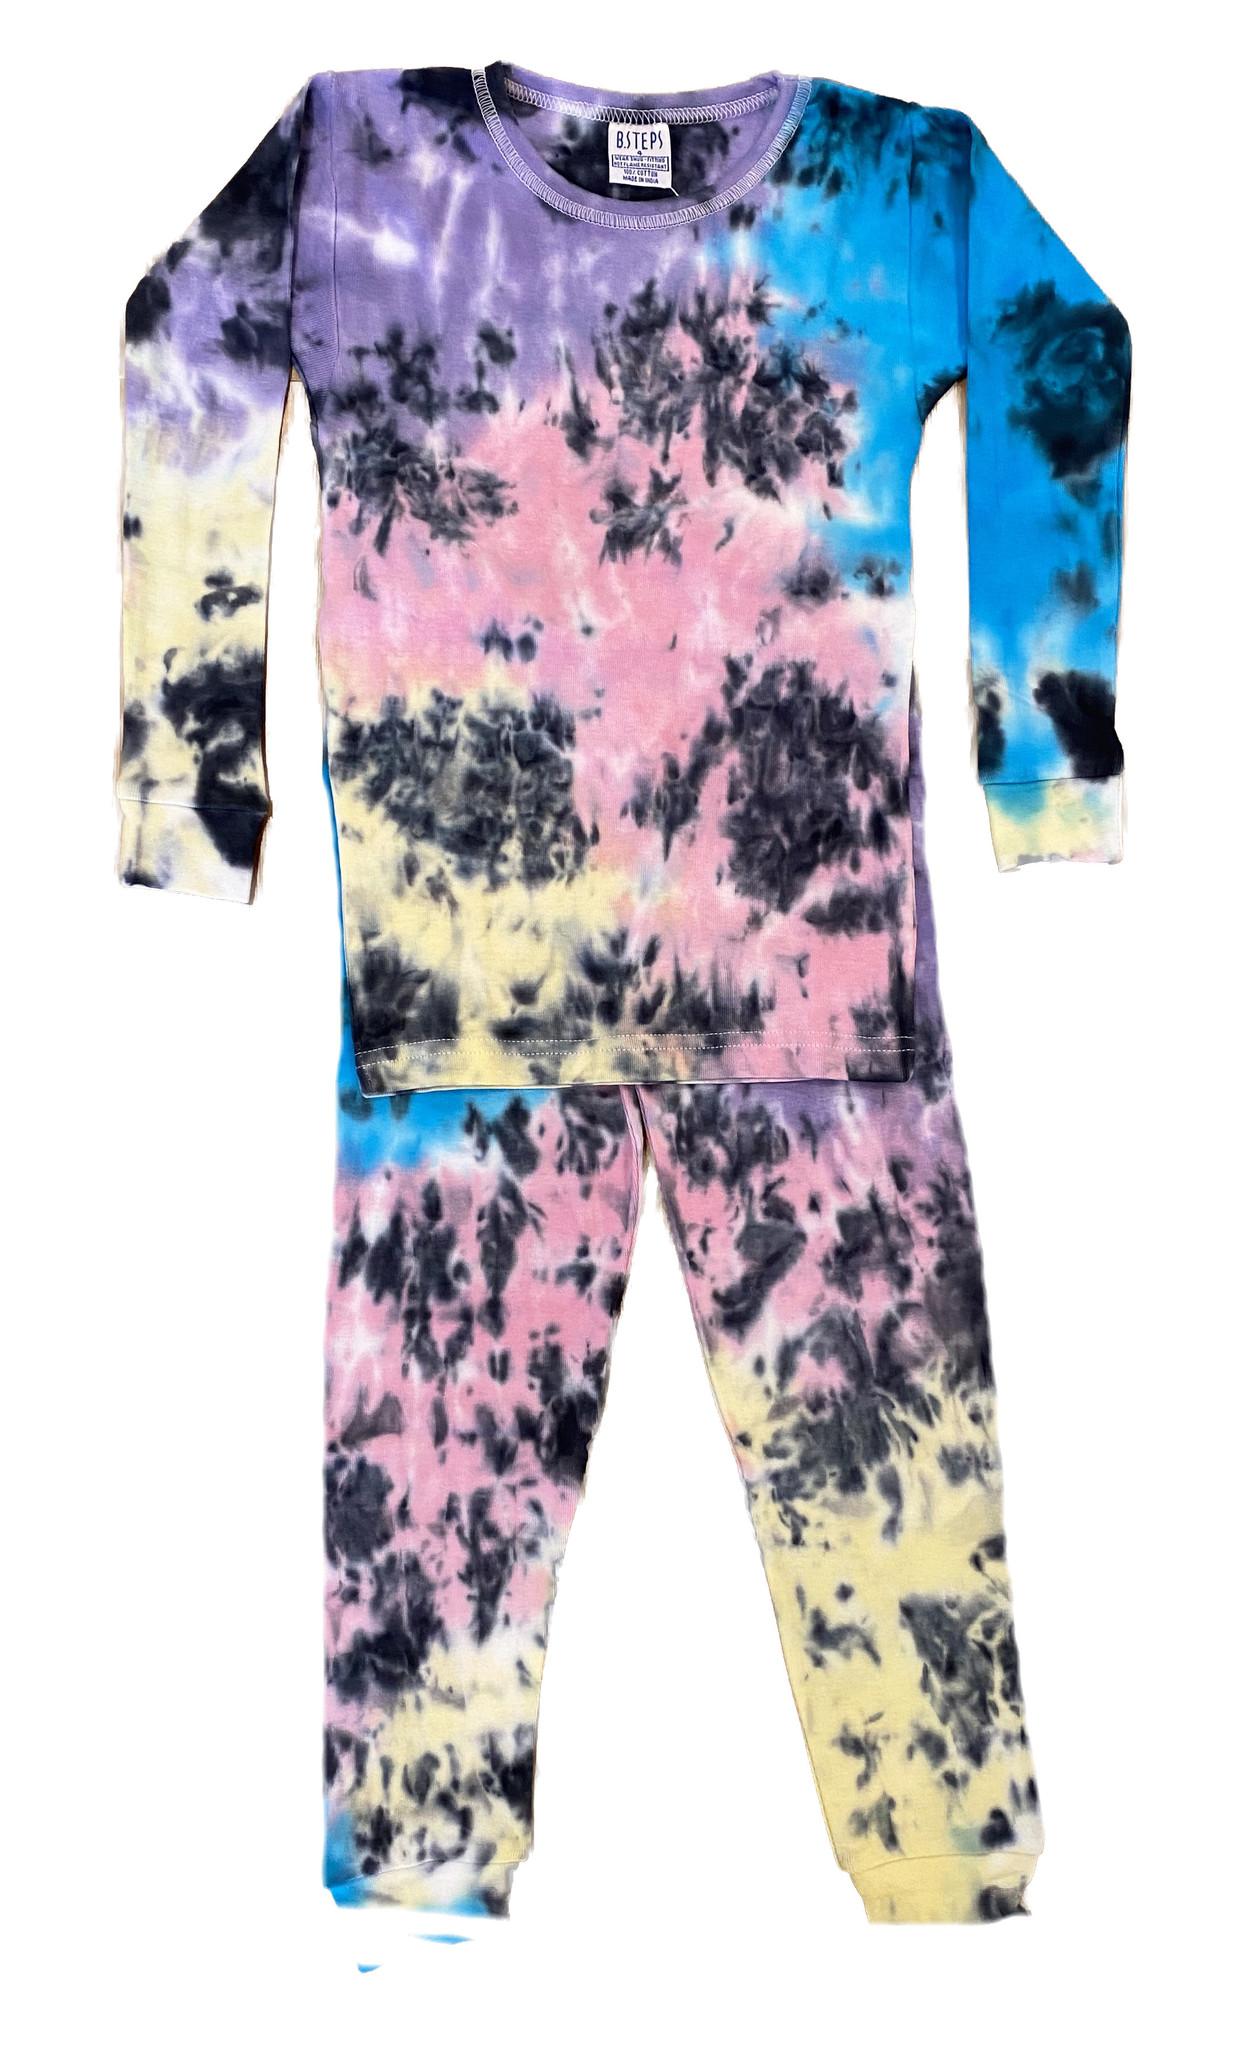 Baby Steps Isla Tie Dye Cotton Infant PJ Set